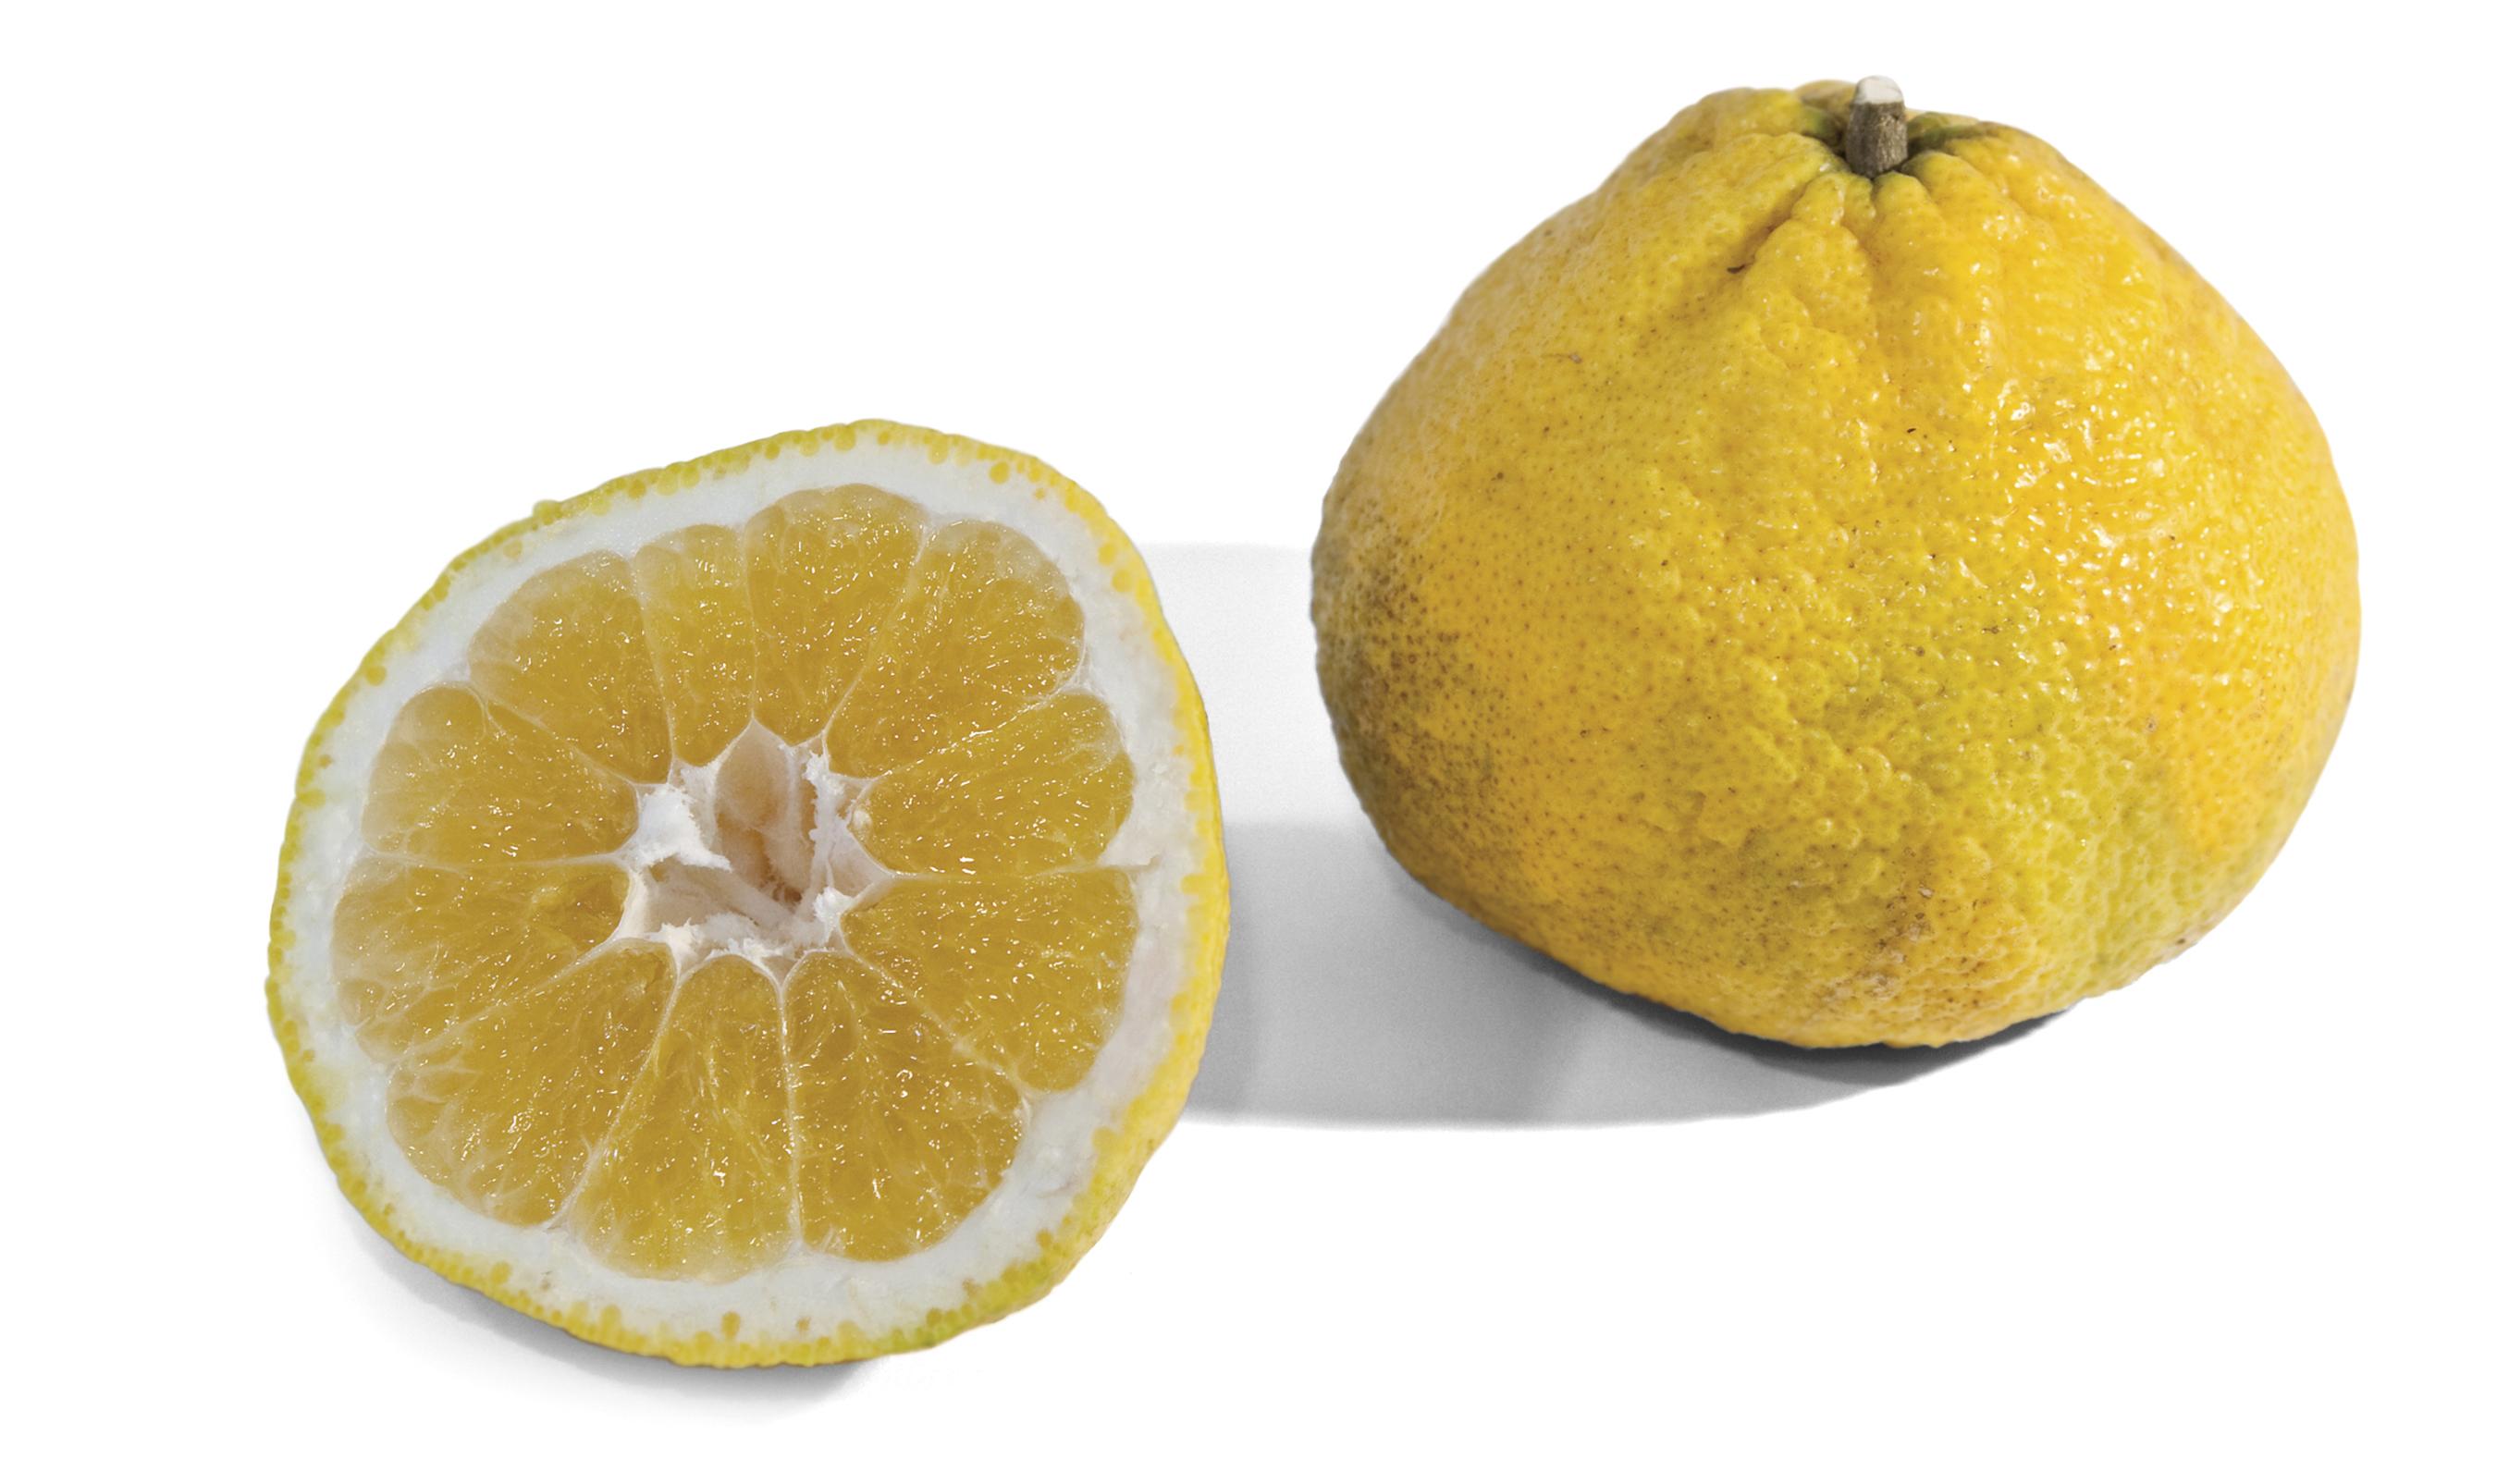 Frieda's Specialty Produce - Ugli Fruit - Uniq Fruit